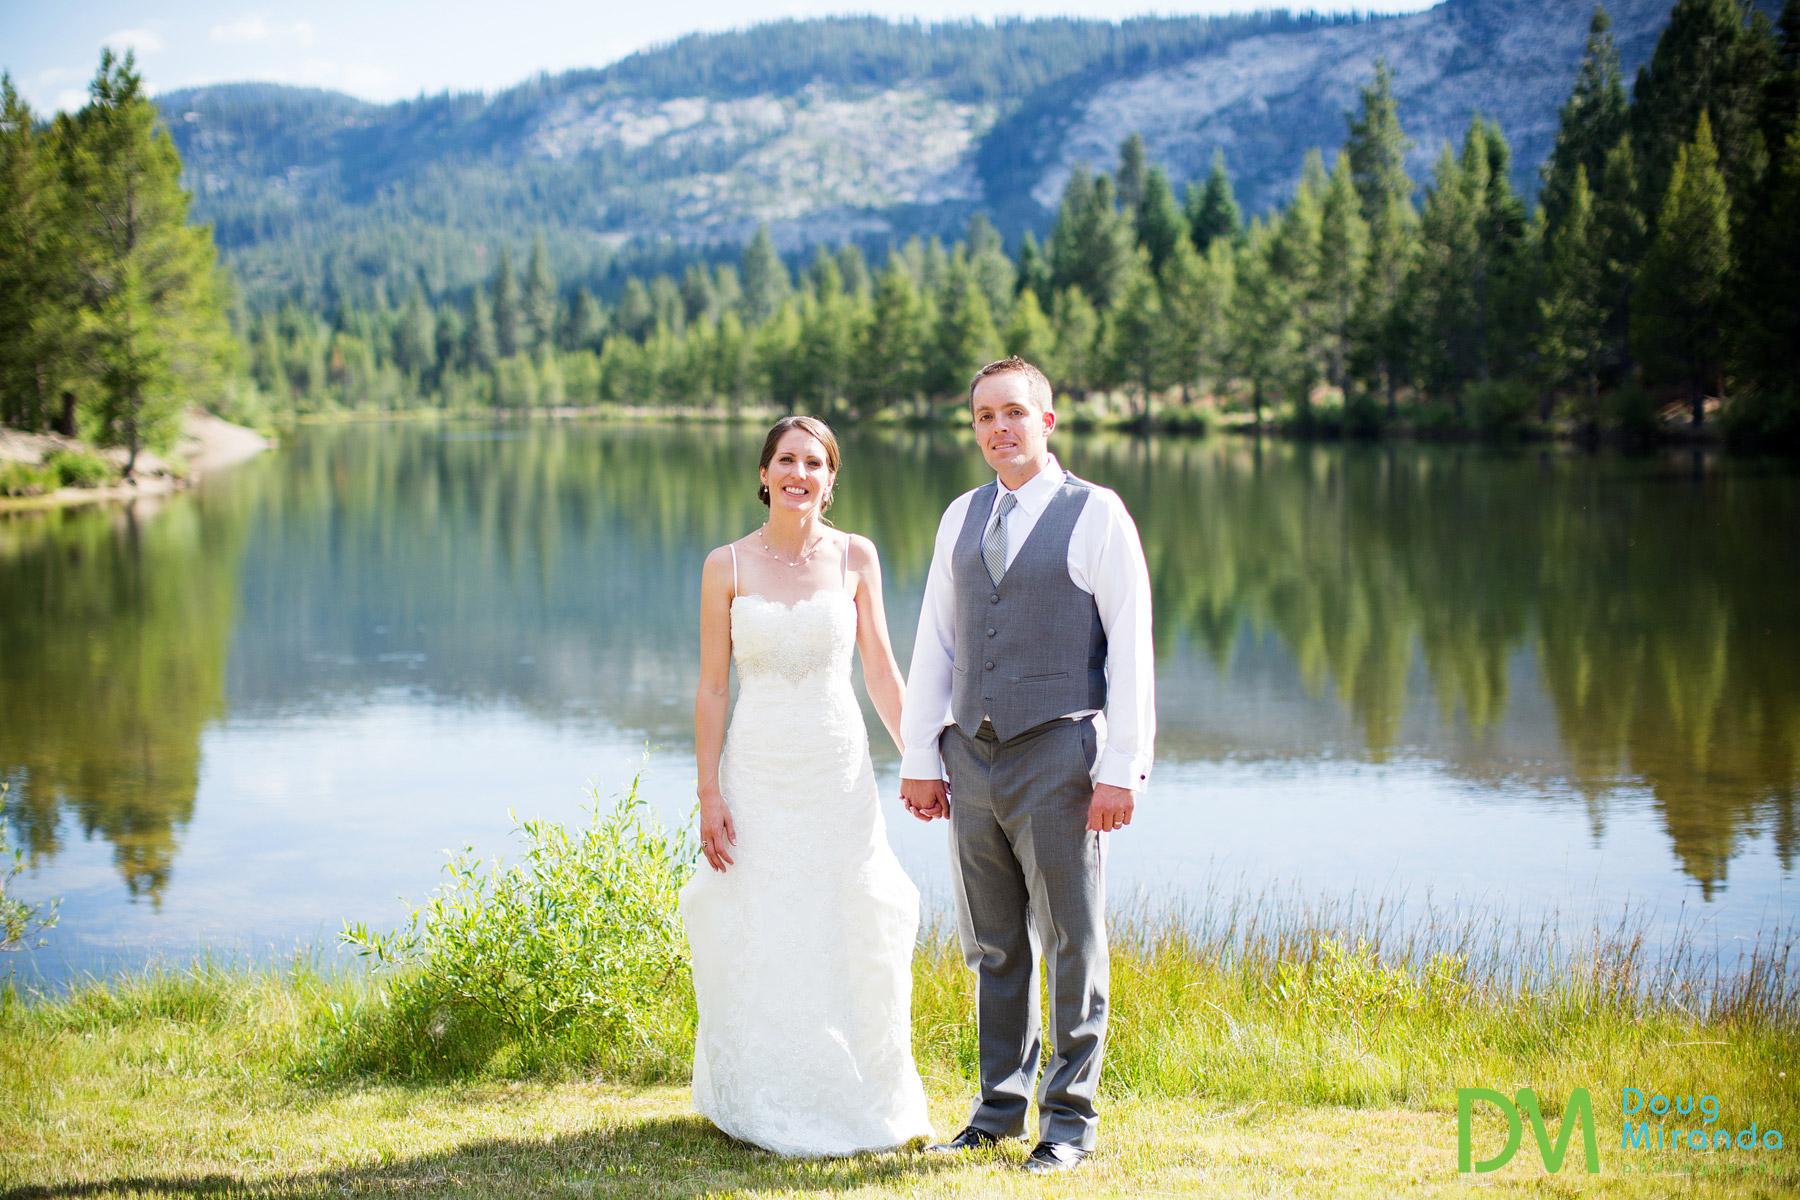 tahoe paradise park wedding